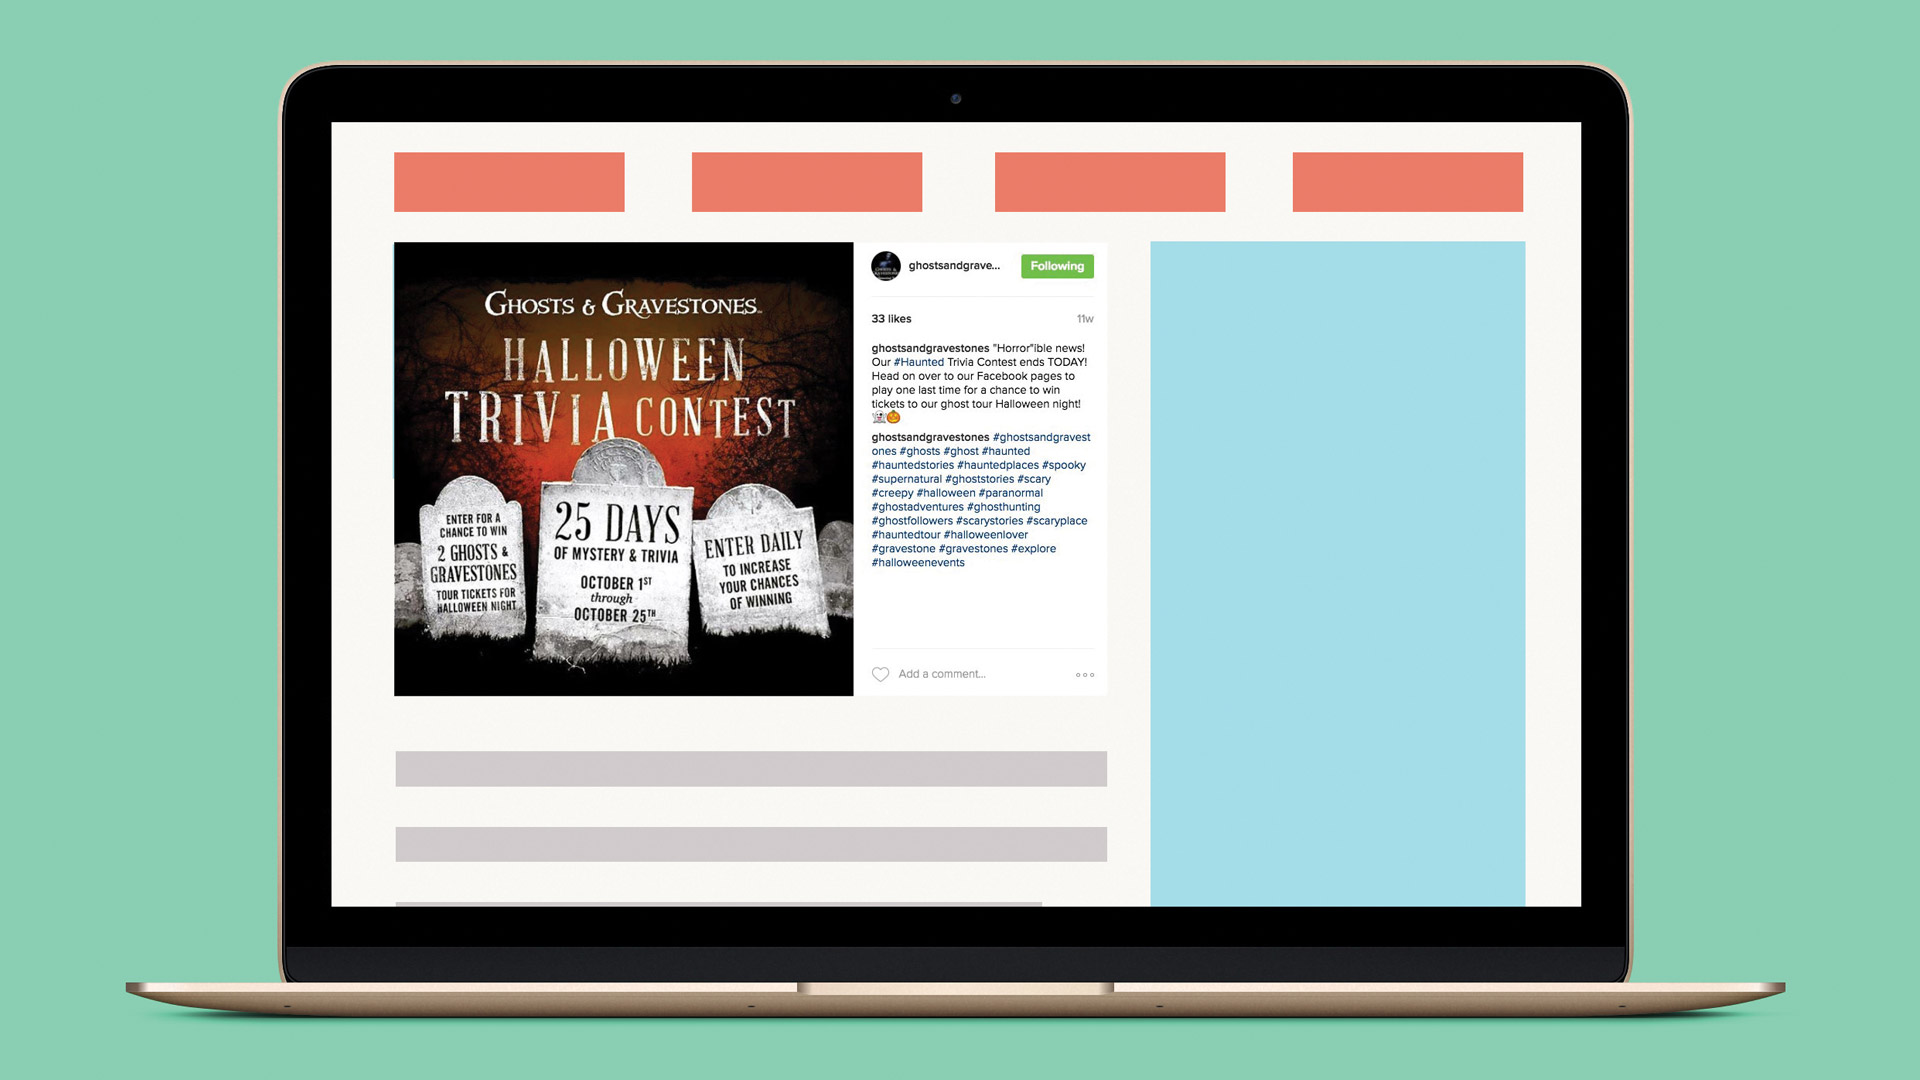 desktop screen showing halloween trivia social media post